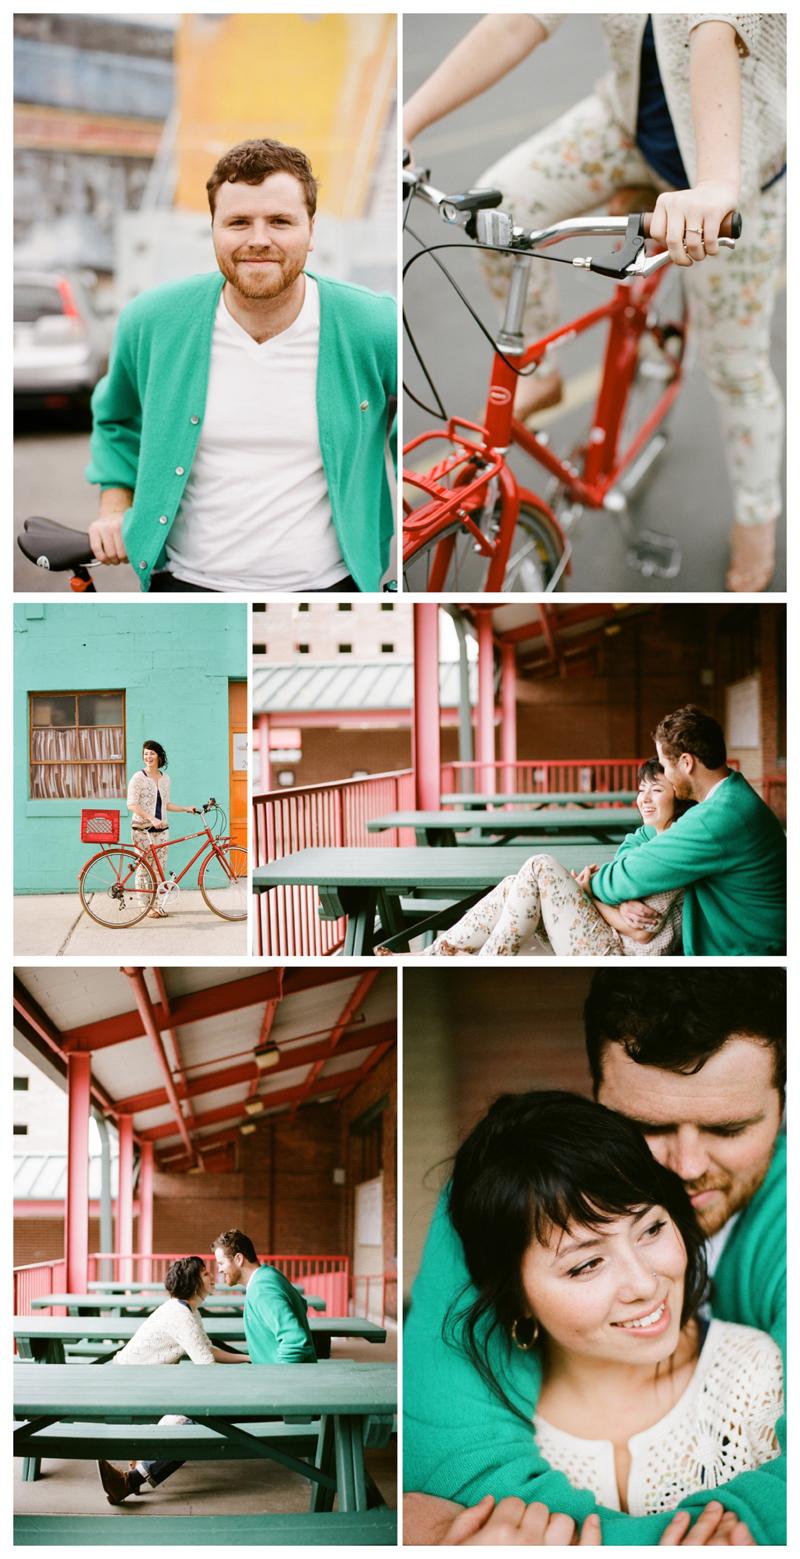 LilyGlassPhotography_artreika_010.jpg